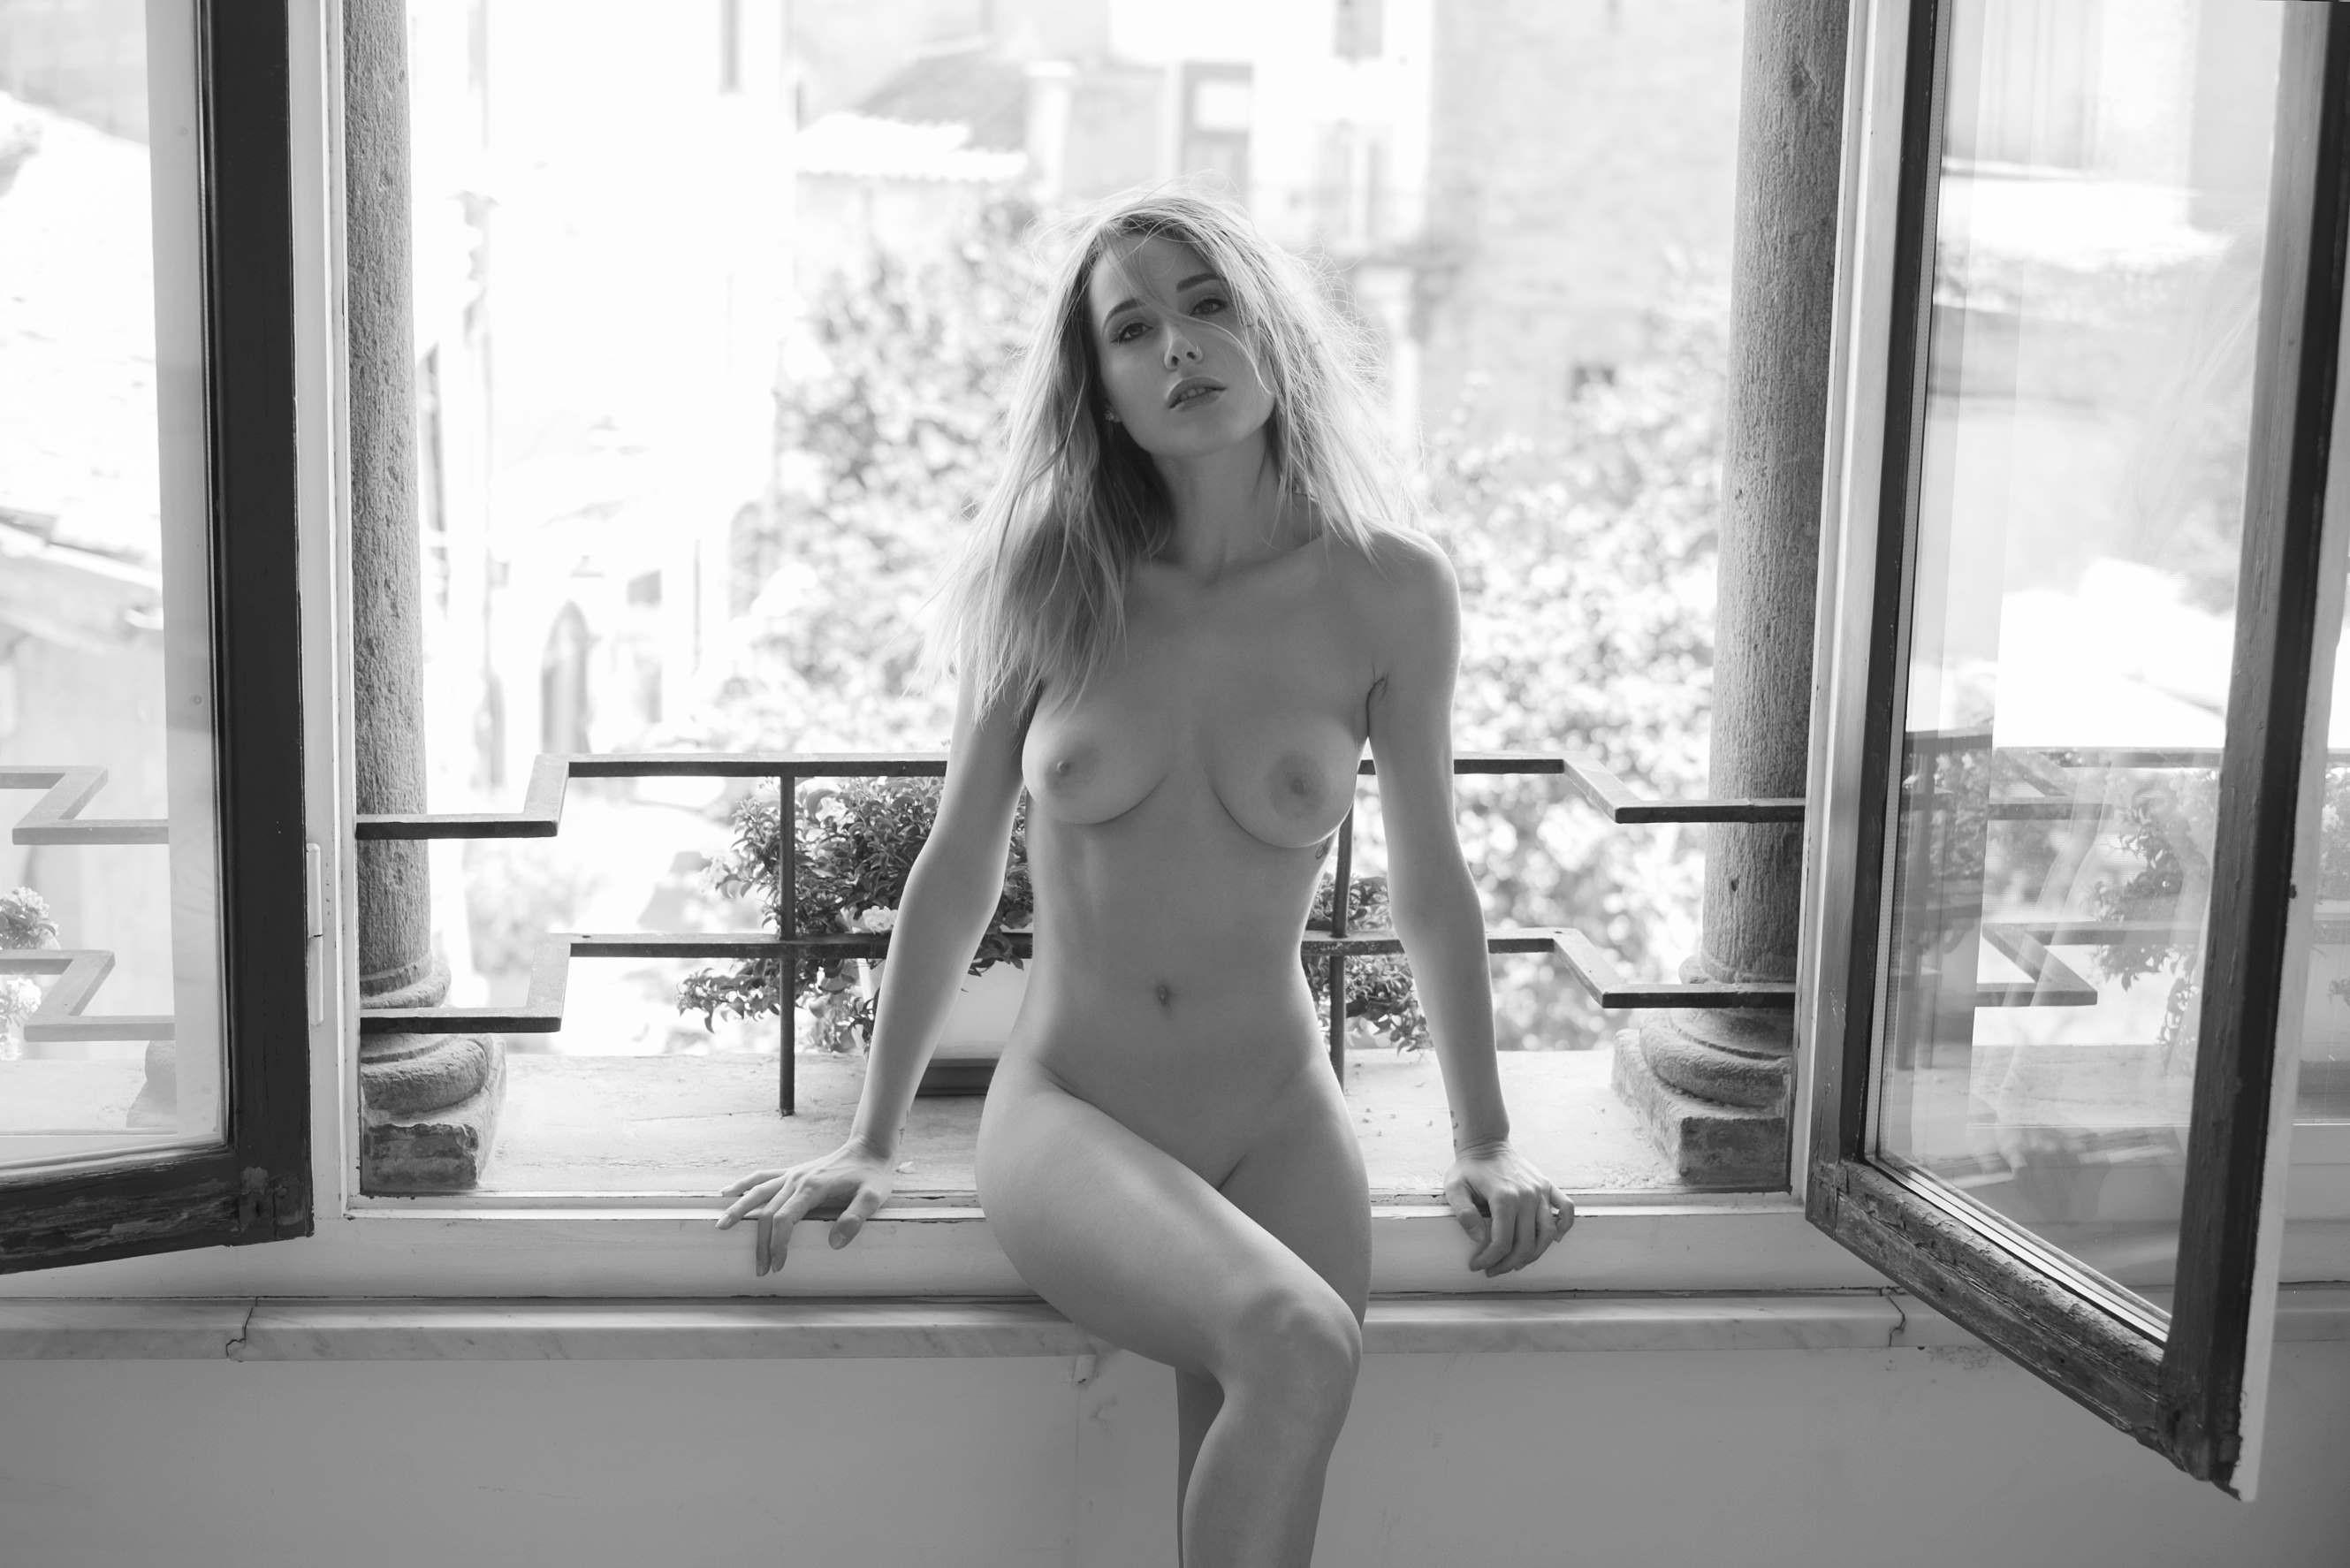 Gray headed lady nudes pics